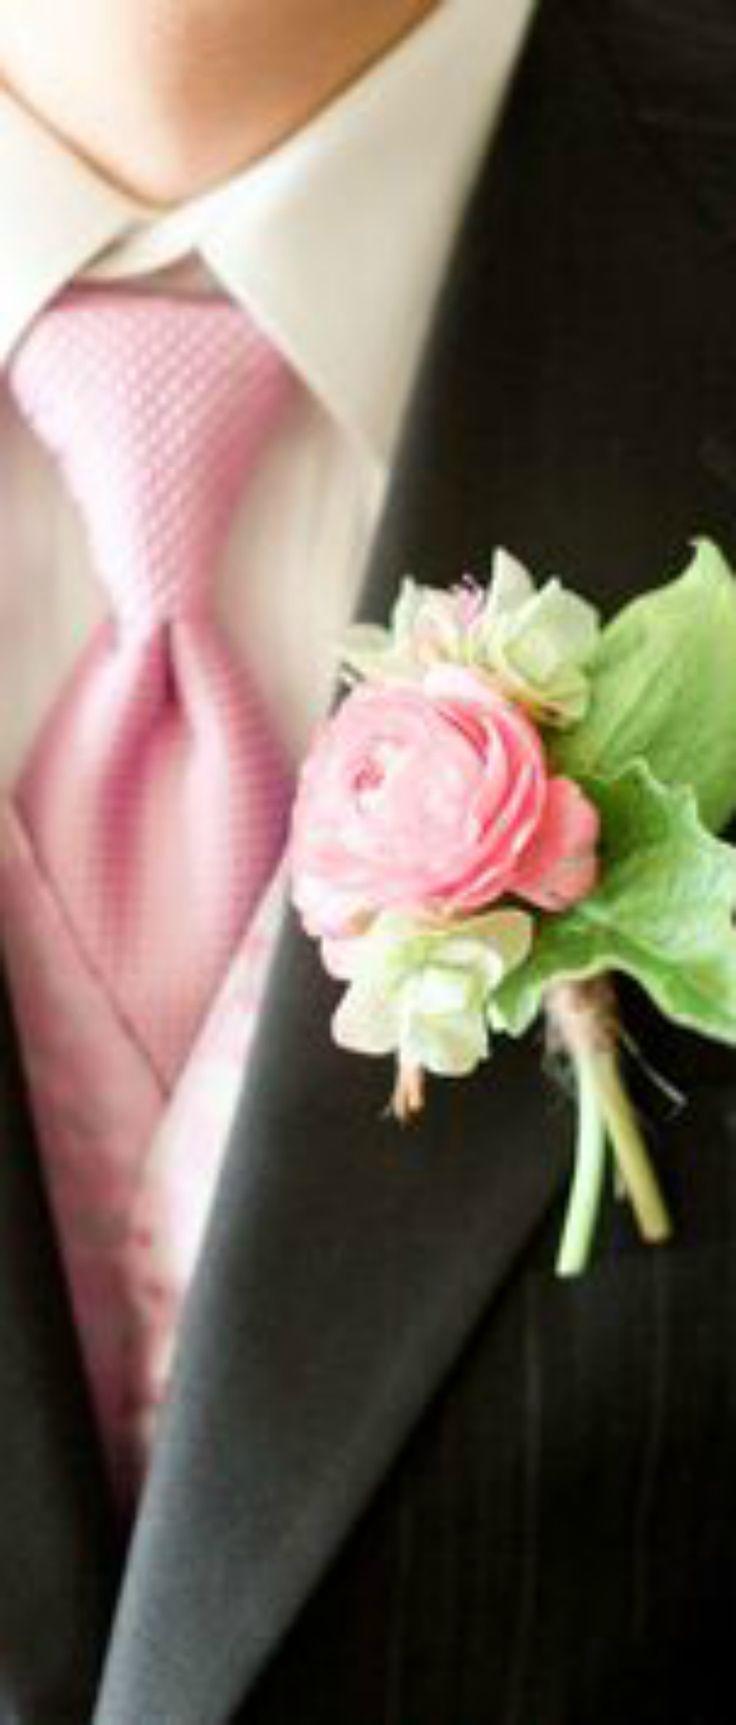 best Elegância images on Pinterest Clothes Beautiful dresses